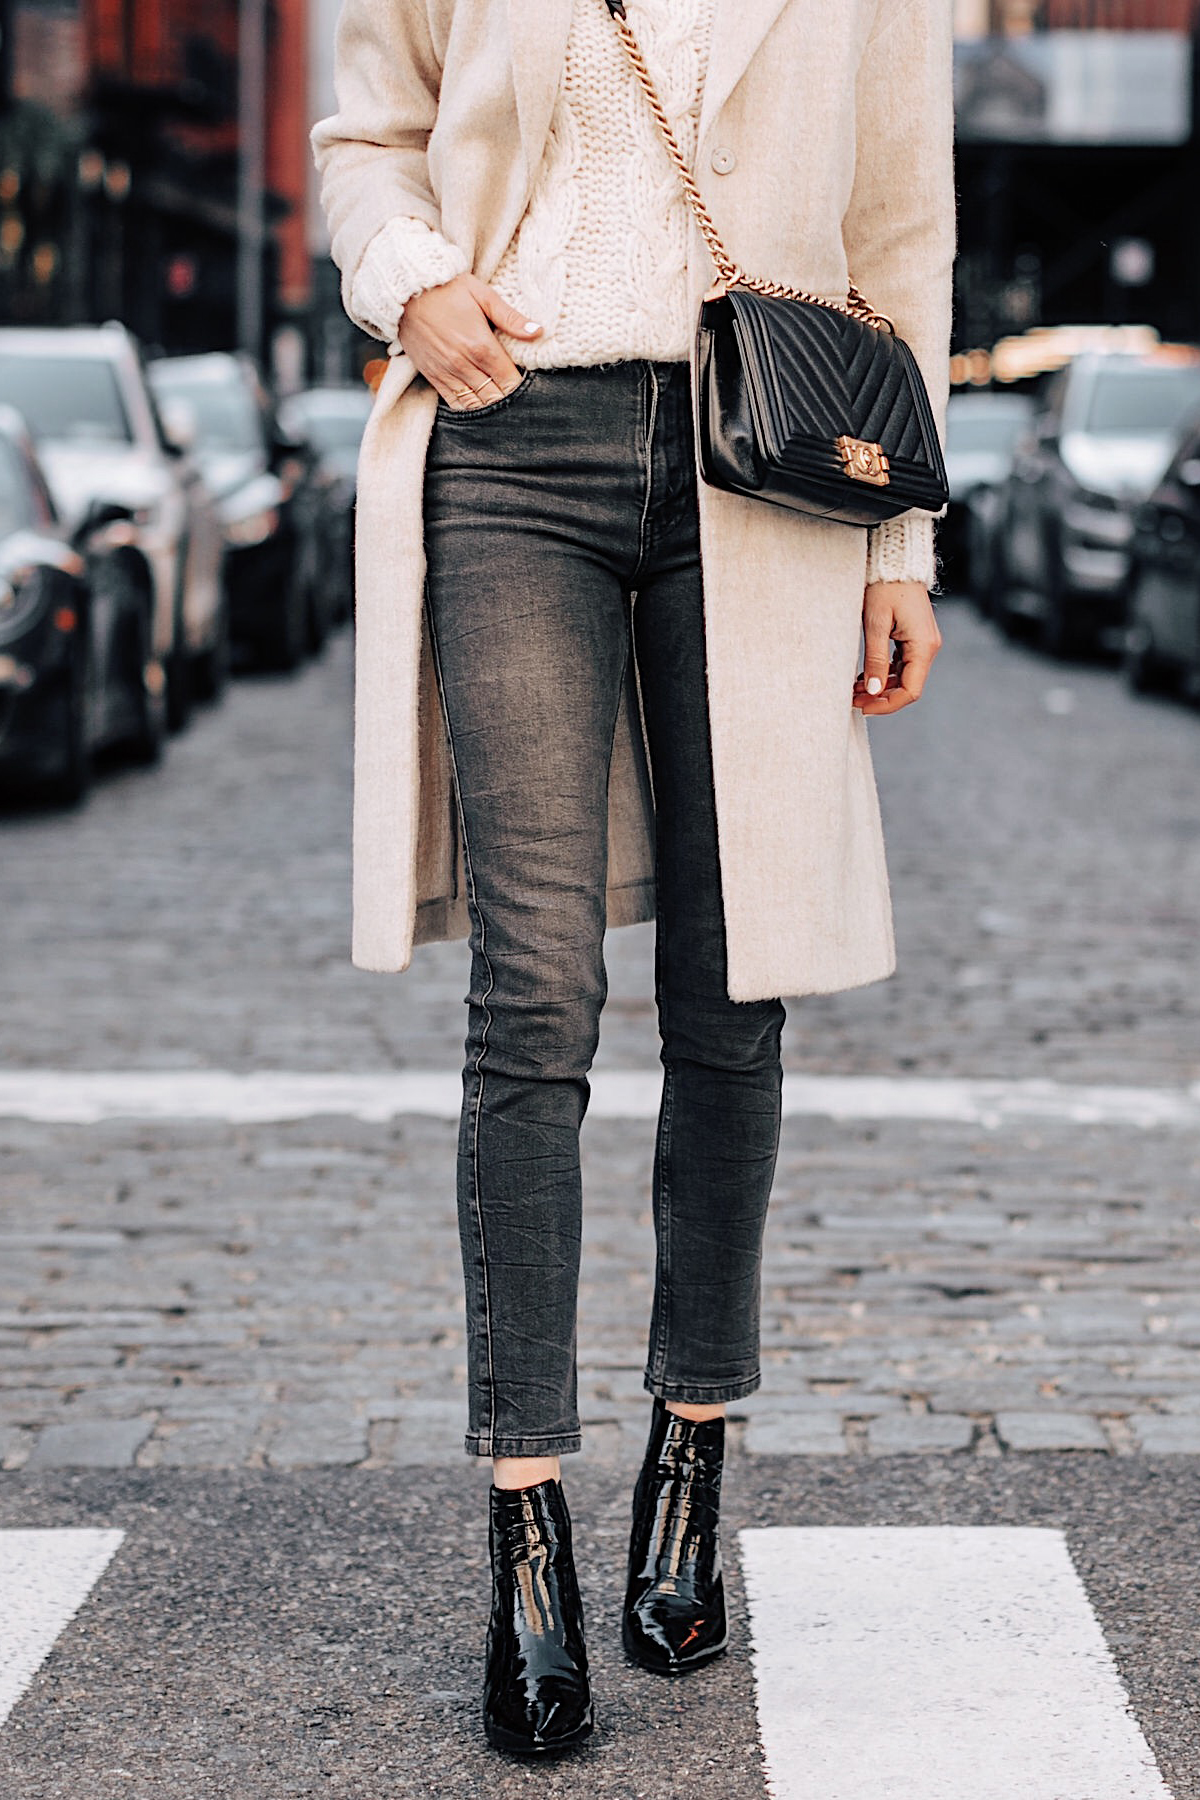 Woman Wearing Anine Bing White Knit Sweater Grey Skinny Jeans Beige Wool Coat Black Ankle Booties Chanel Black Boy Bag Fashion Jackson Fashion Blogger NYFW Street Style